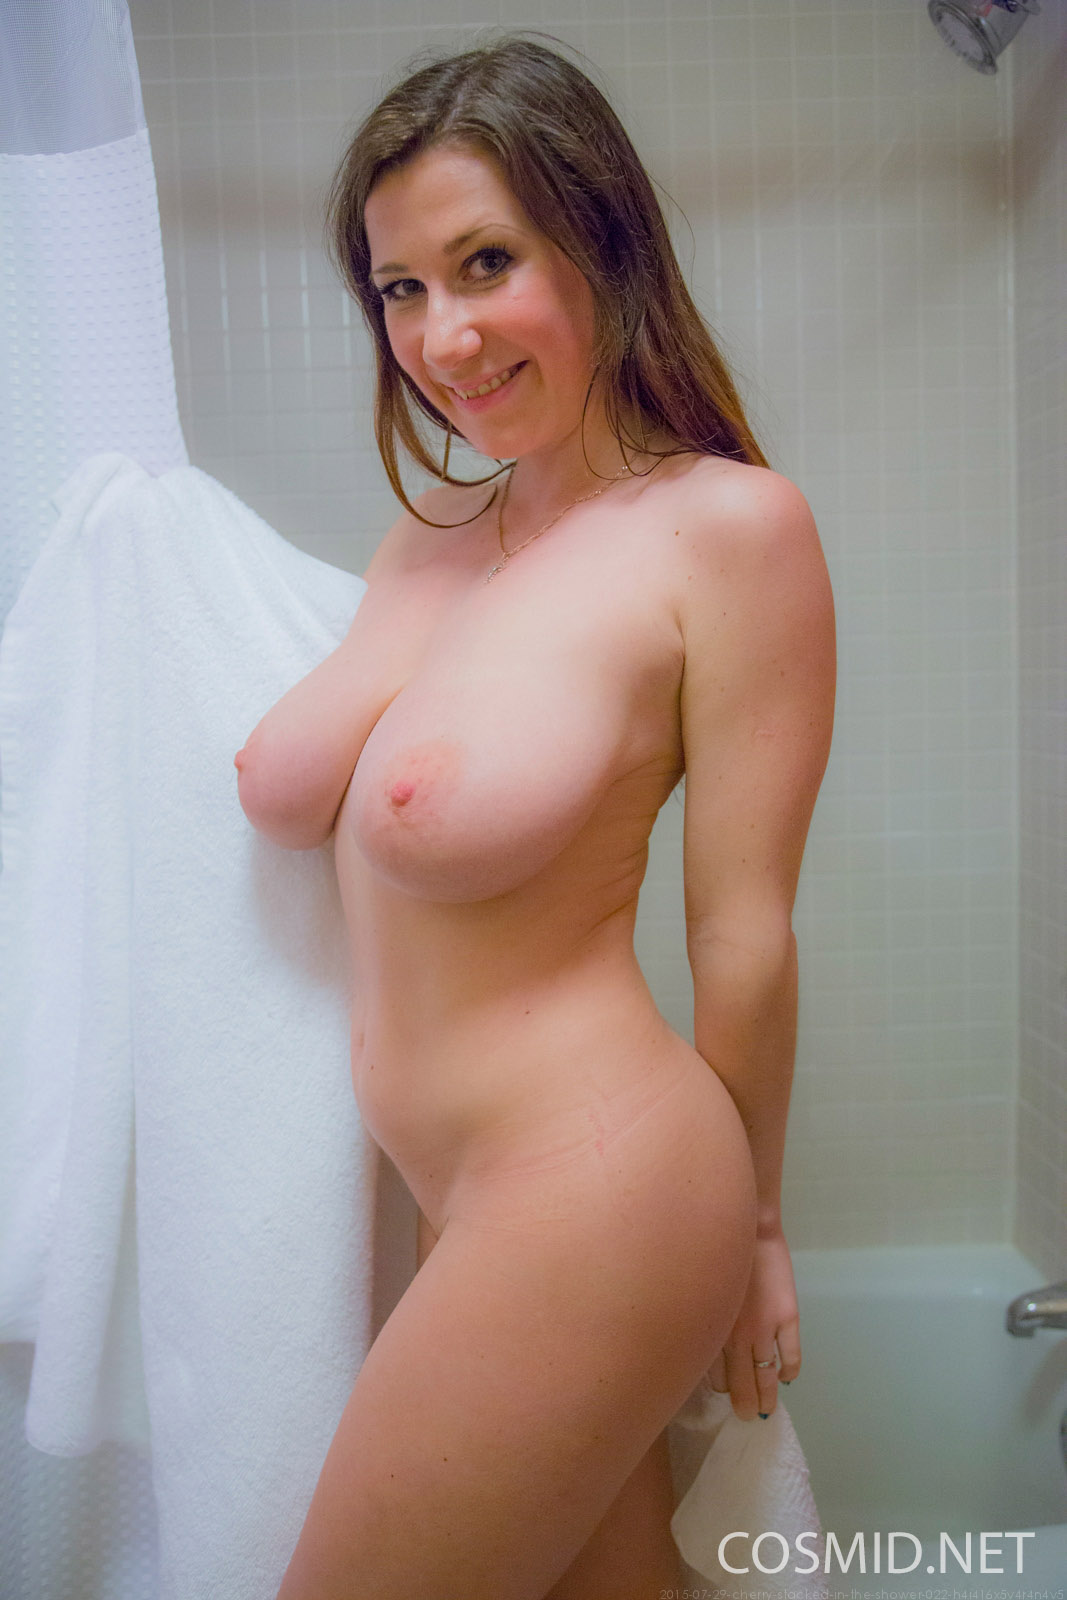 Cherry in shower naked